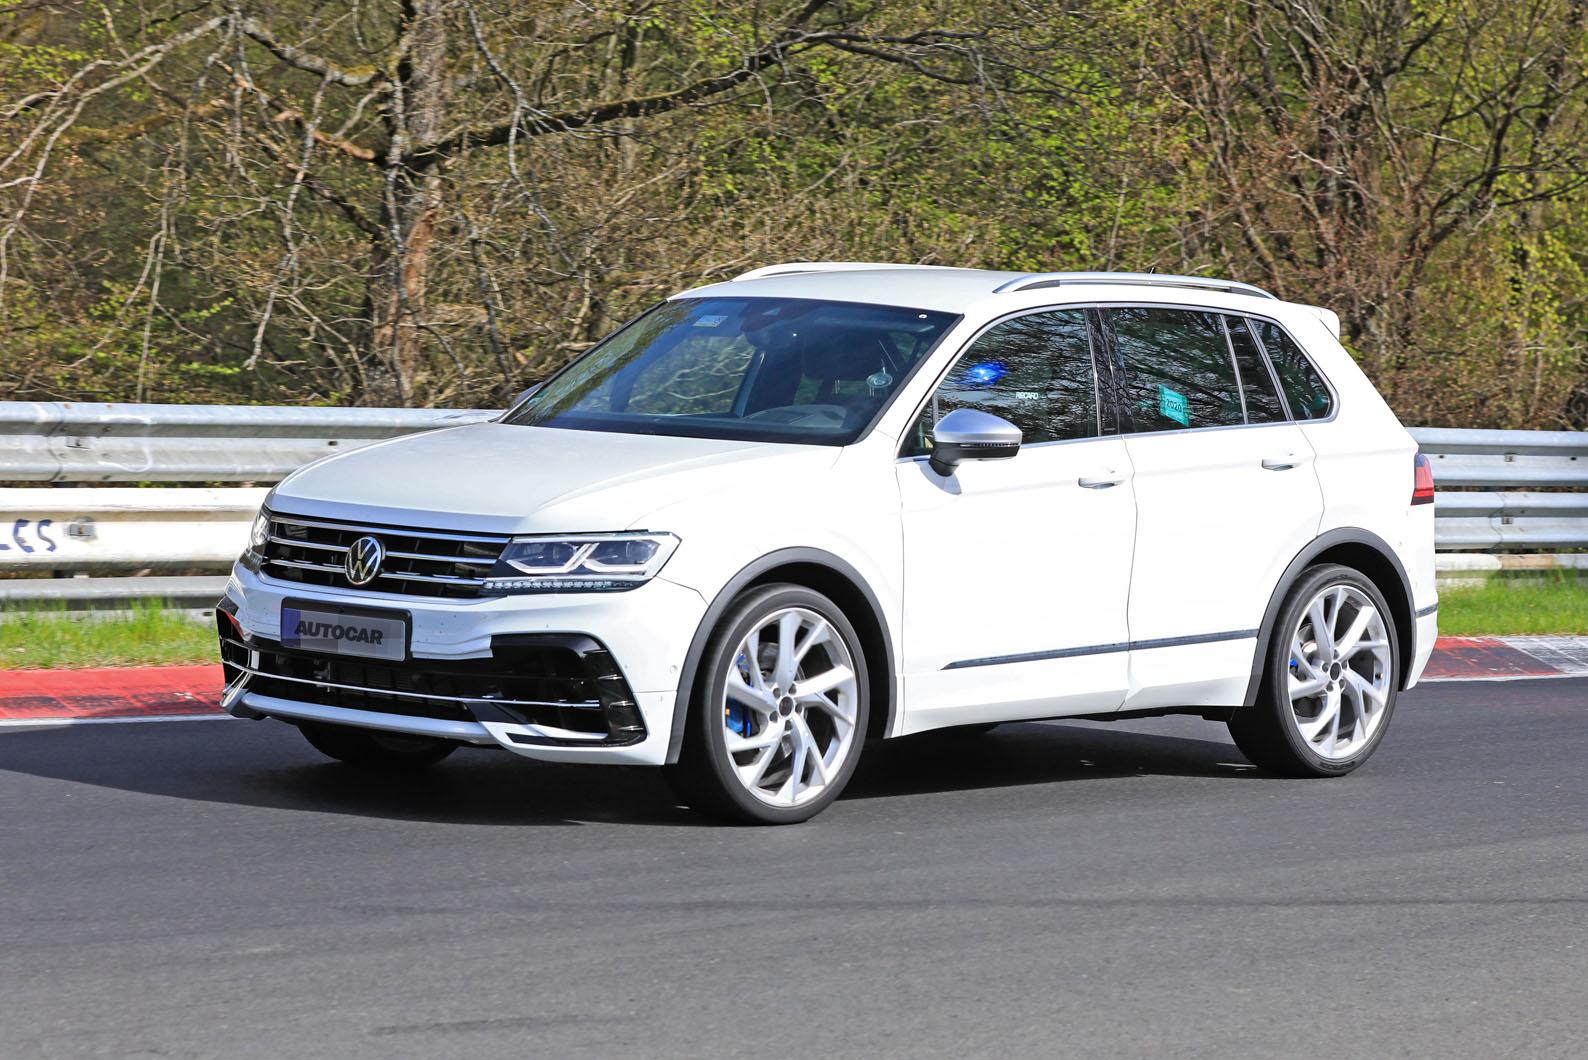 2020 Volkswagen Tiguan R Prototype Previews Suv S Facelift Autocar